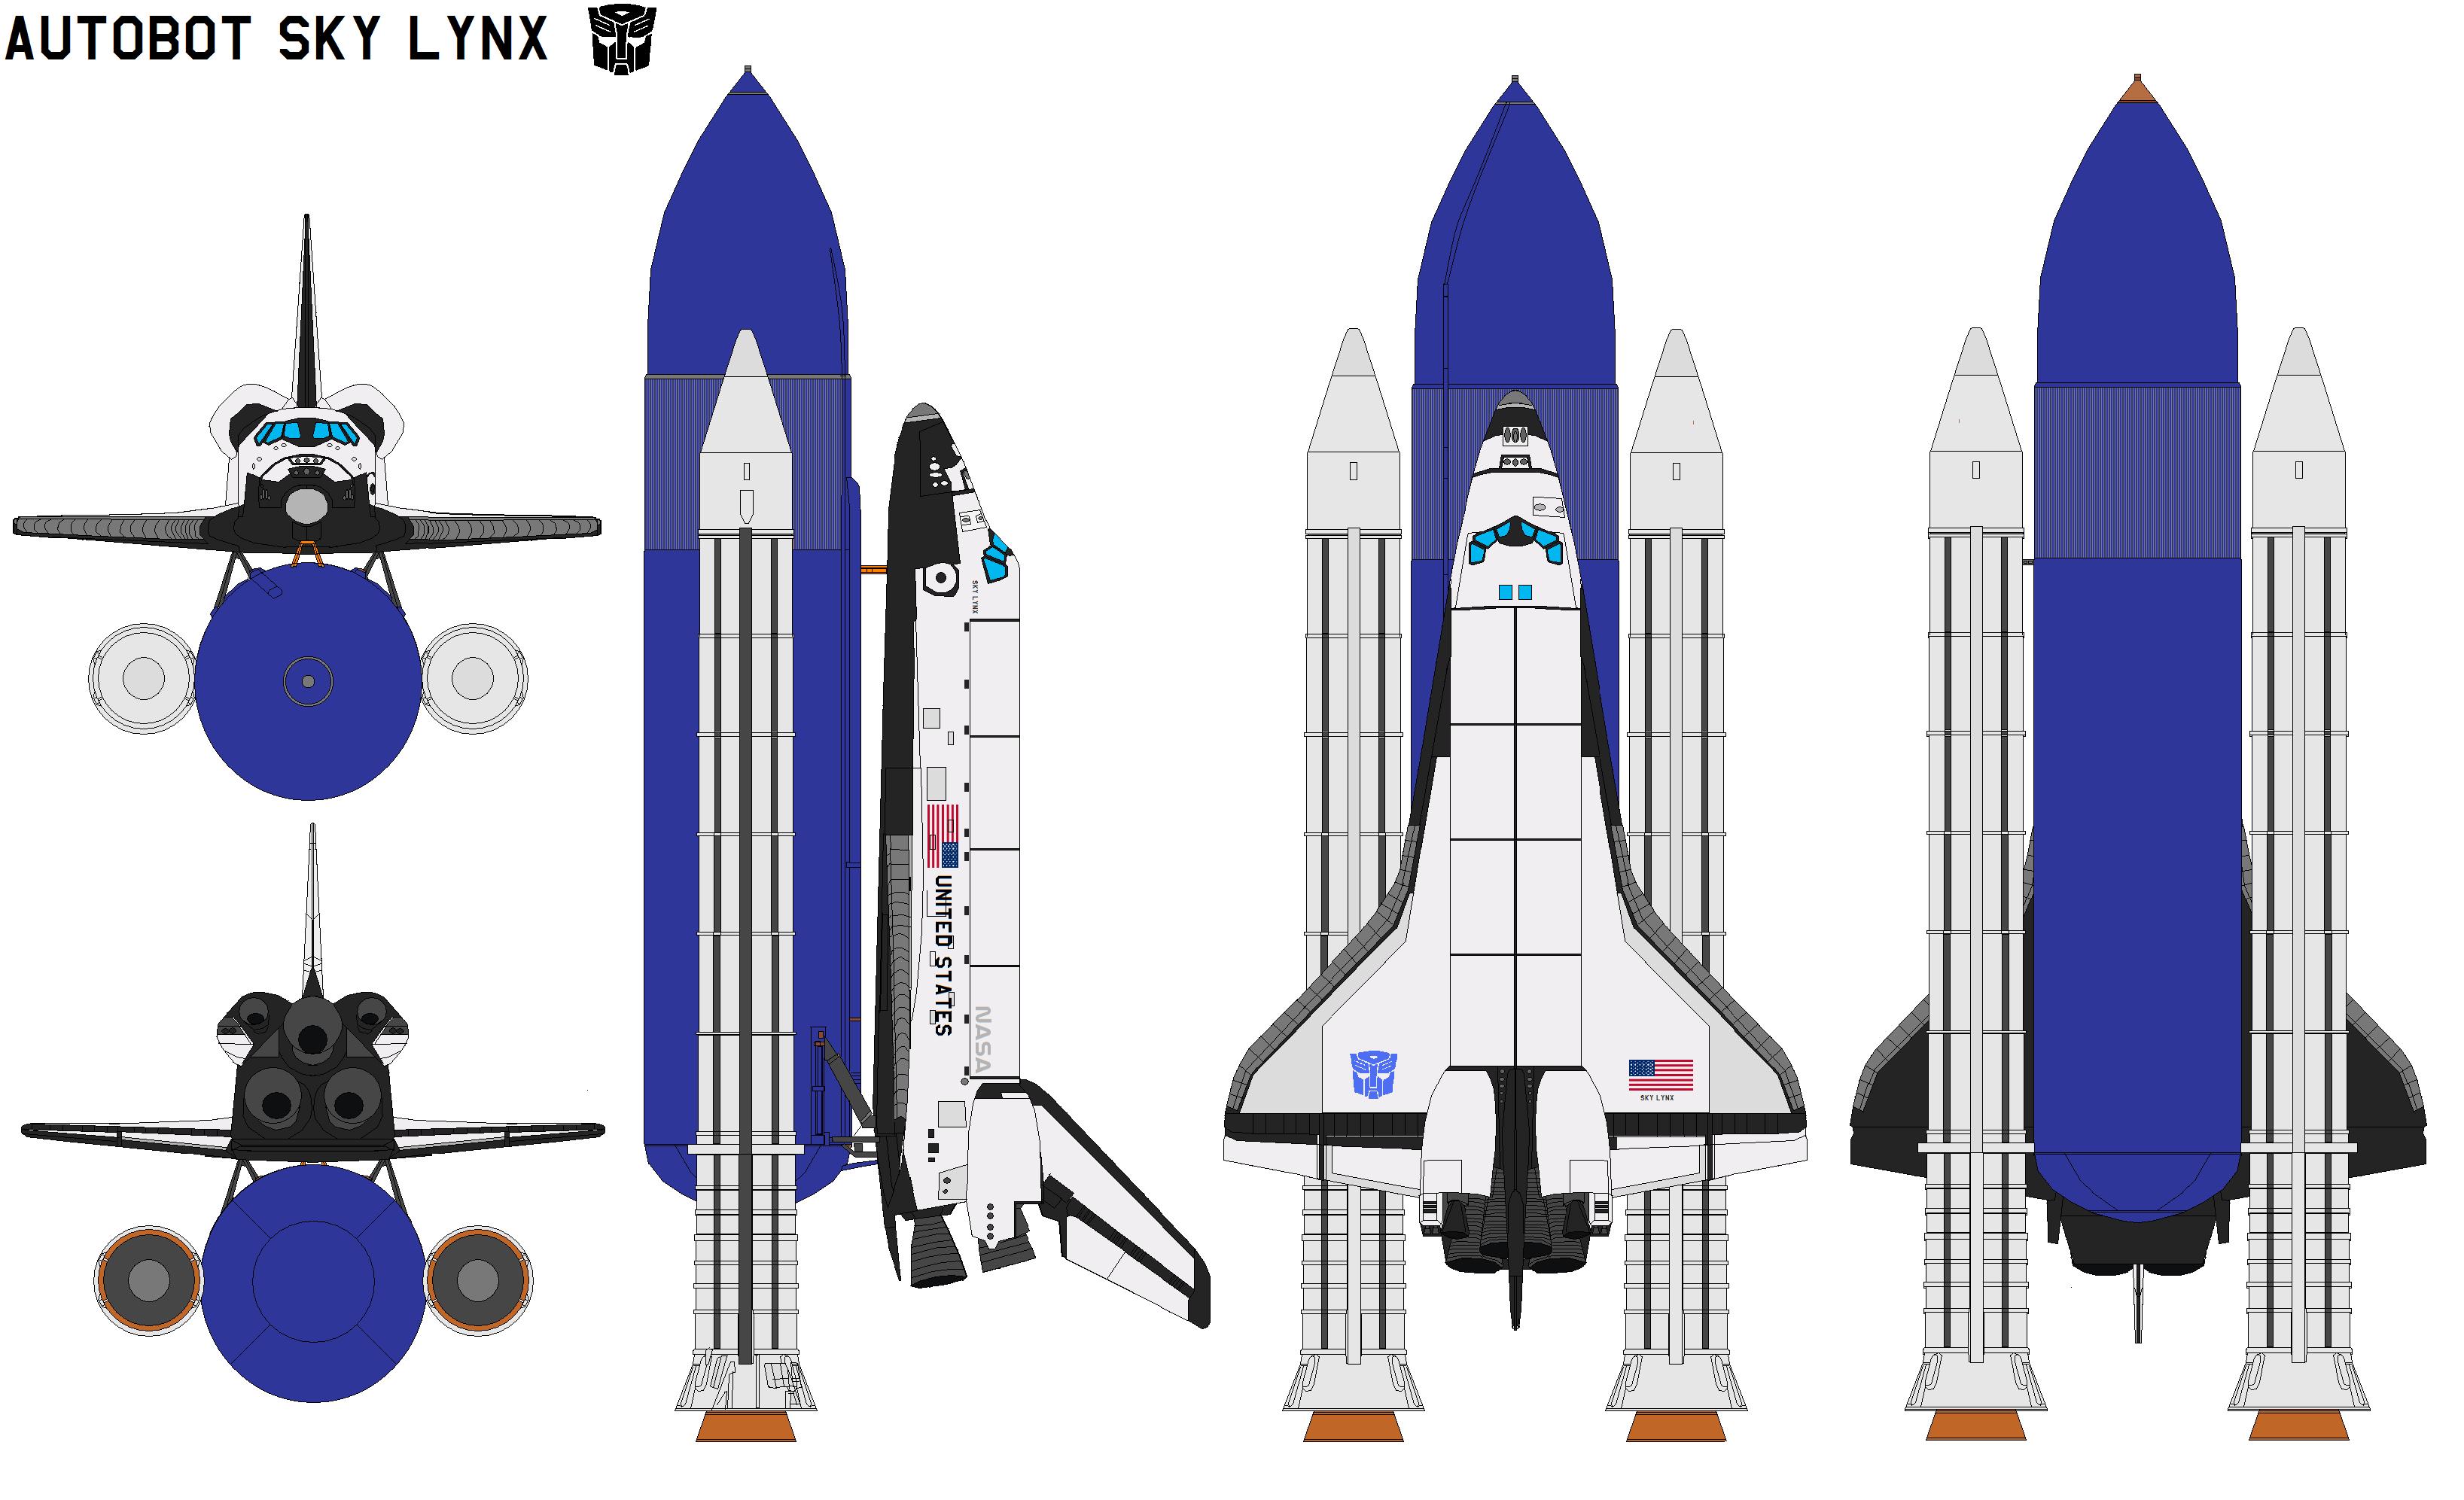 autobot space shuttle - photo #48